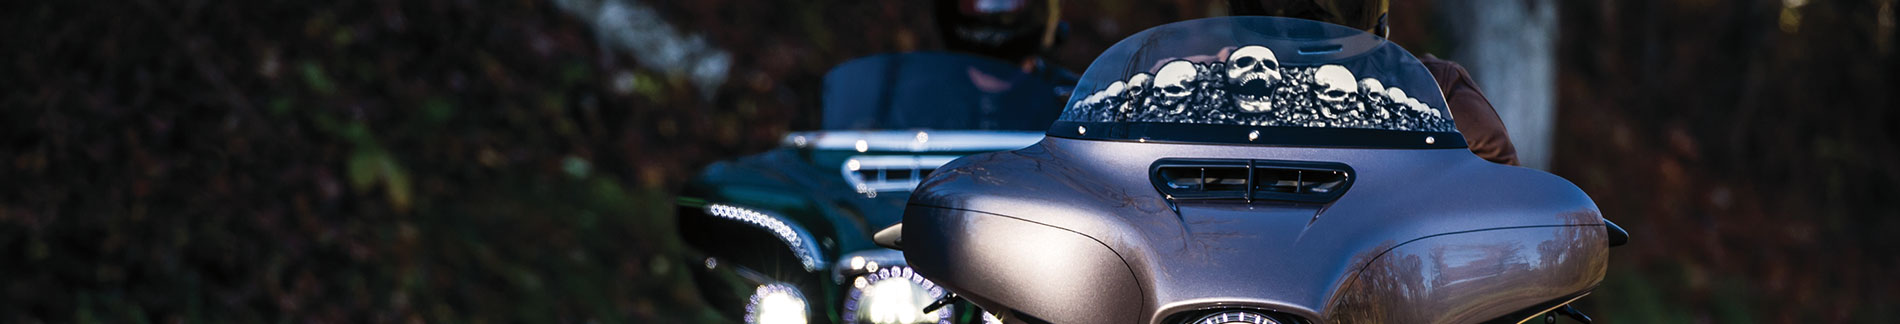 1 Pair Dark Smoke Air Deflectors for 2018-20 Honda Gold Wing Motorcycles Kuryakyn 6579 Air Management Motorcycle Accessory